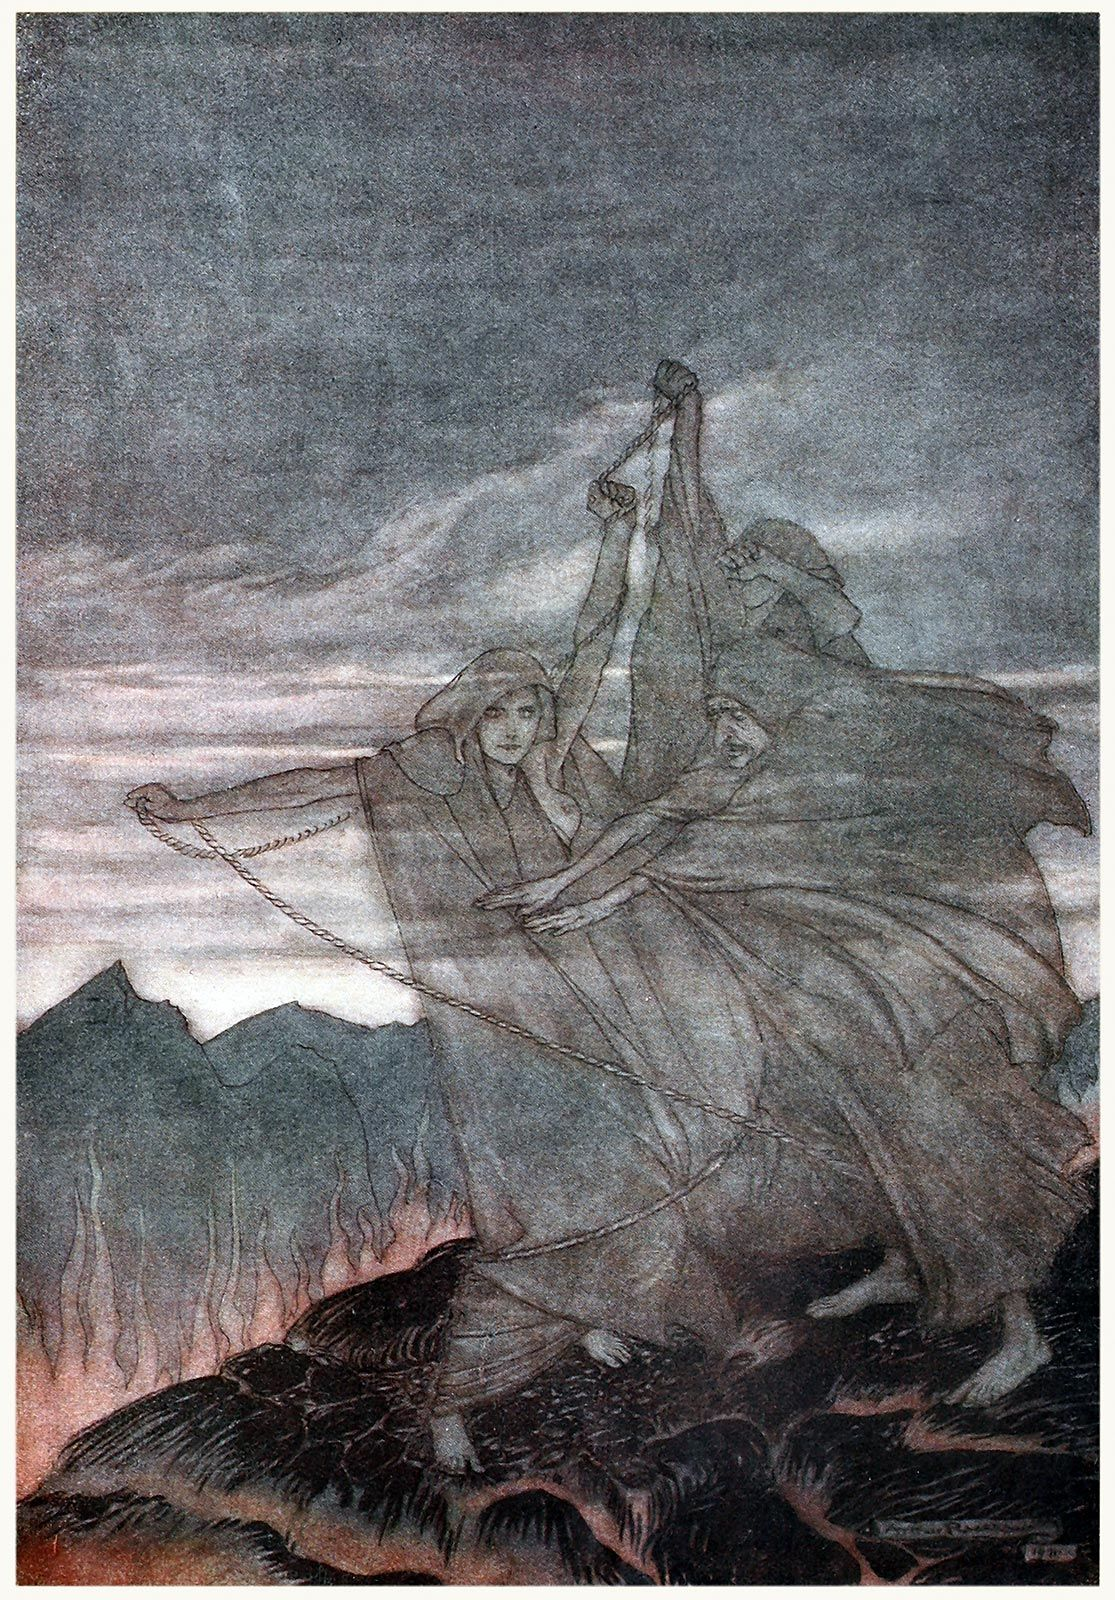 The Norns vanish.    Arthur Rackham, from Siegfried & The twilight of the gods, by Richard Wagner, London, 1911.